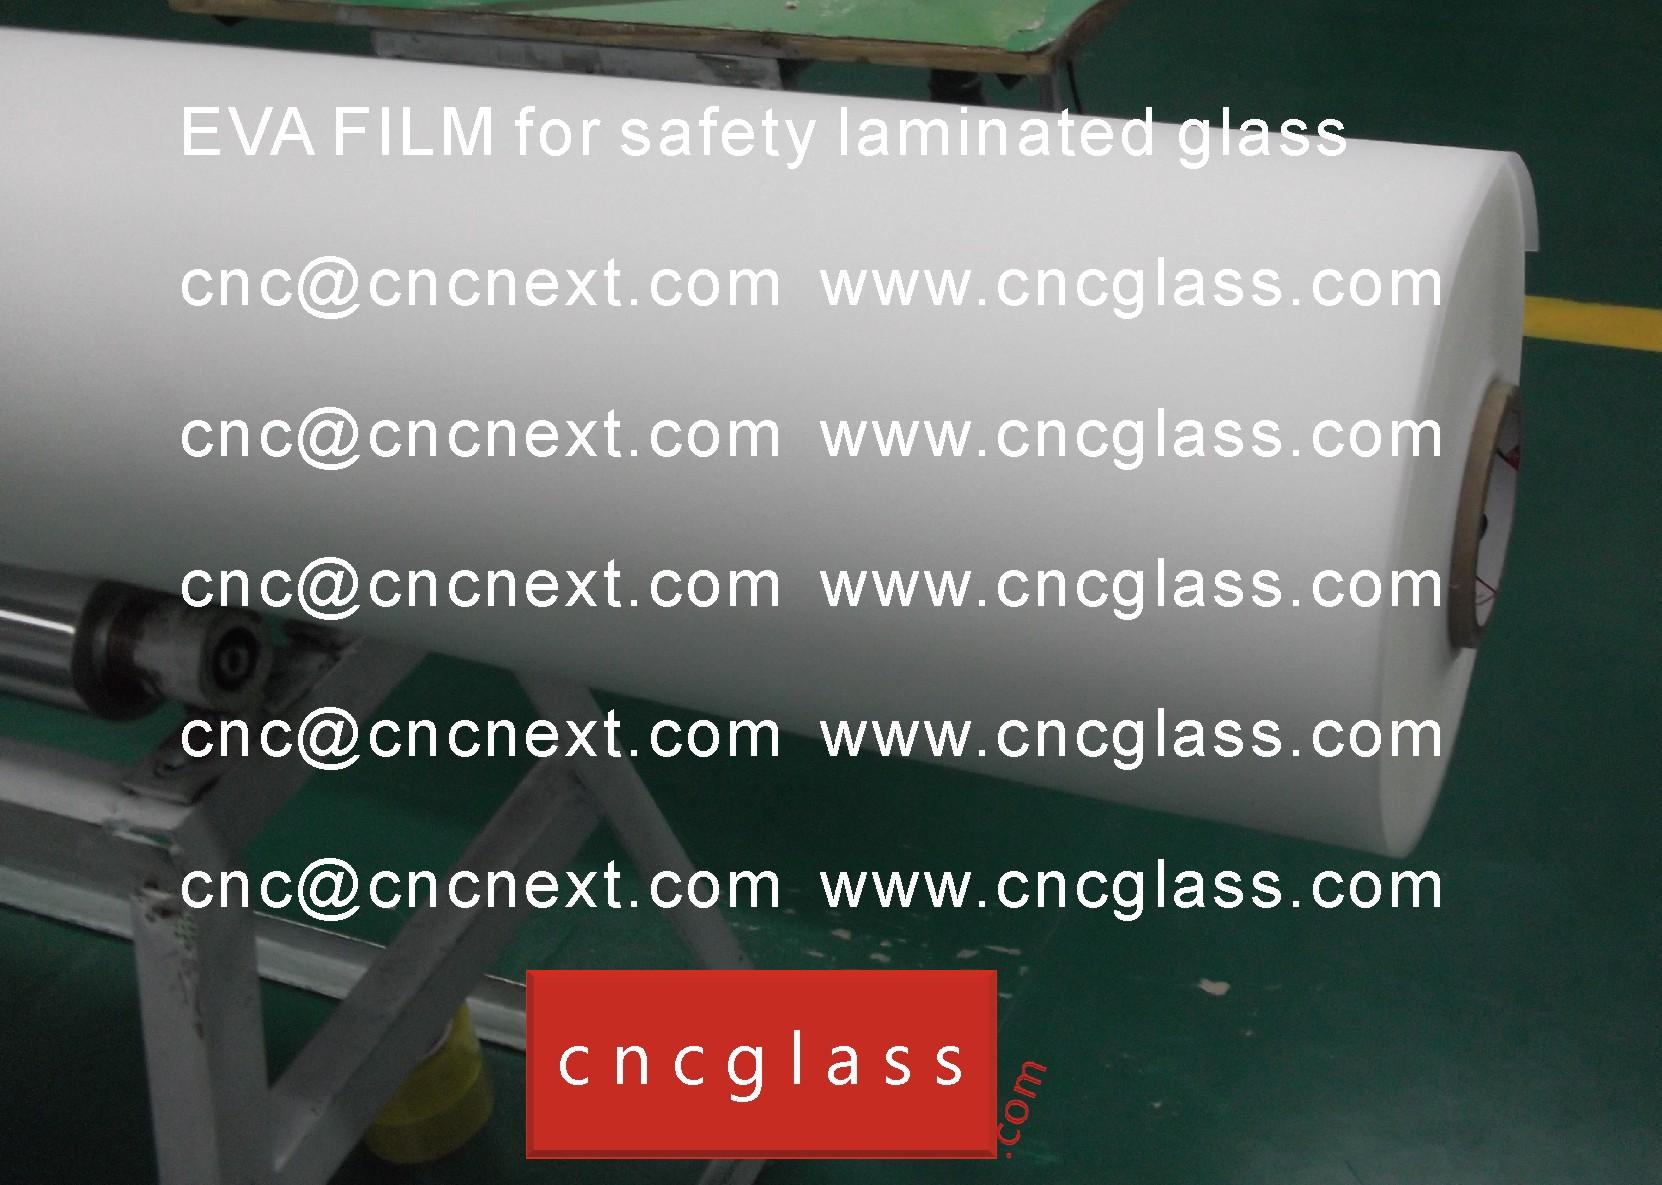 003 EVAFORCE EVA FILM FOR SAFETY LAMINATED GLASS